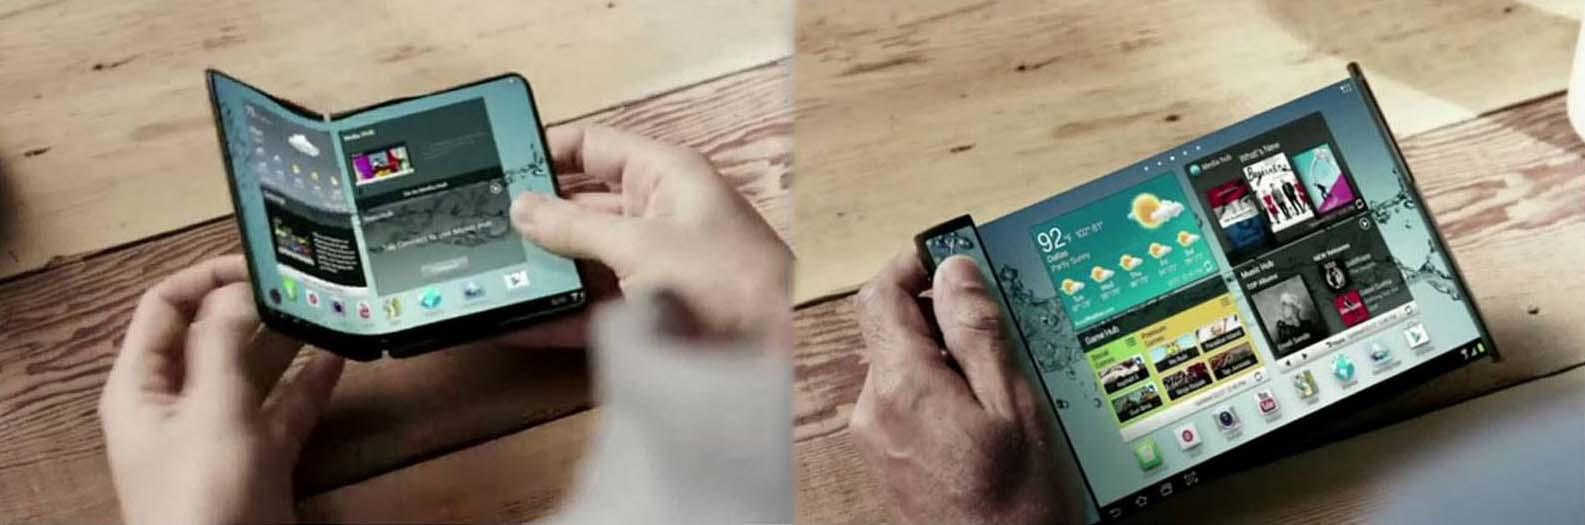 Samsung foldable phone-cum-tablet